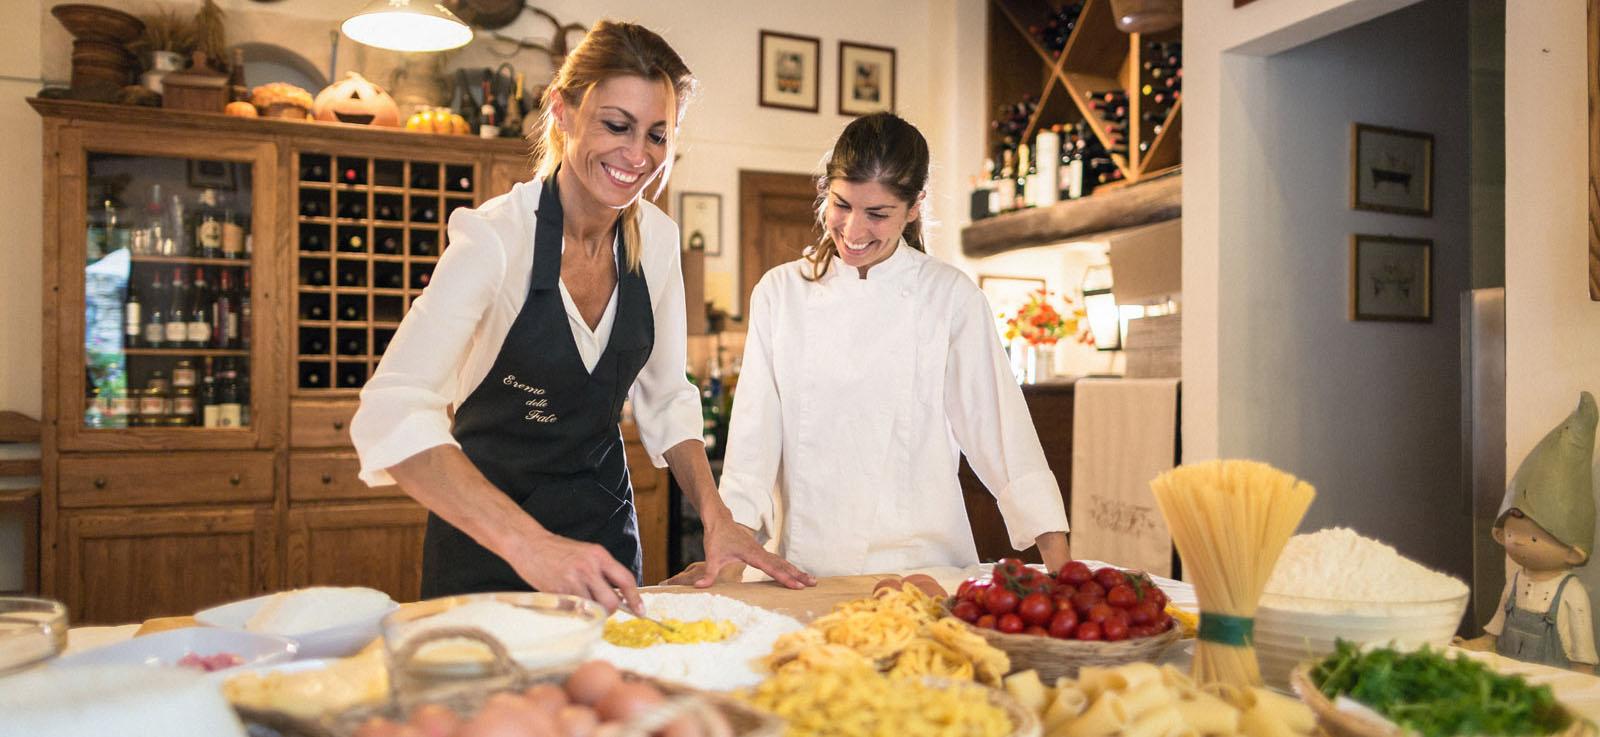 Corsi di cucina agriturismo eremo delle fate - Corsi di cucina a piacenza ...